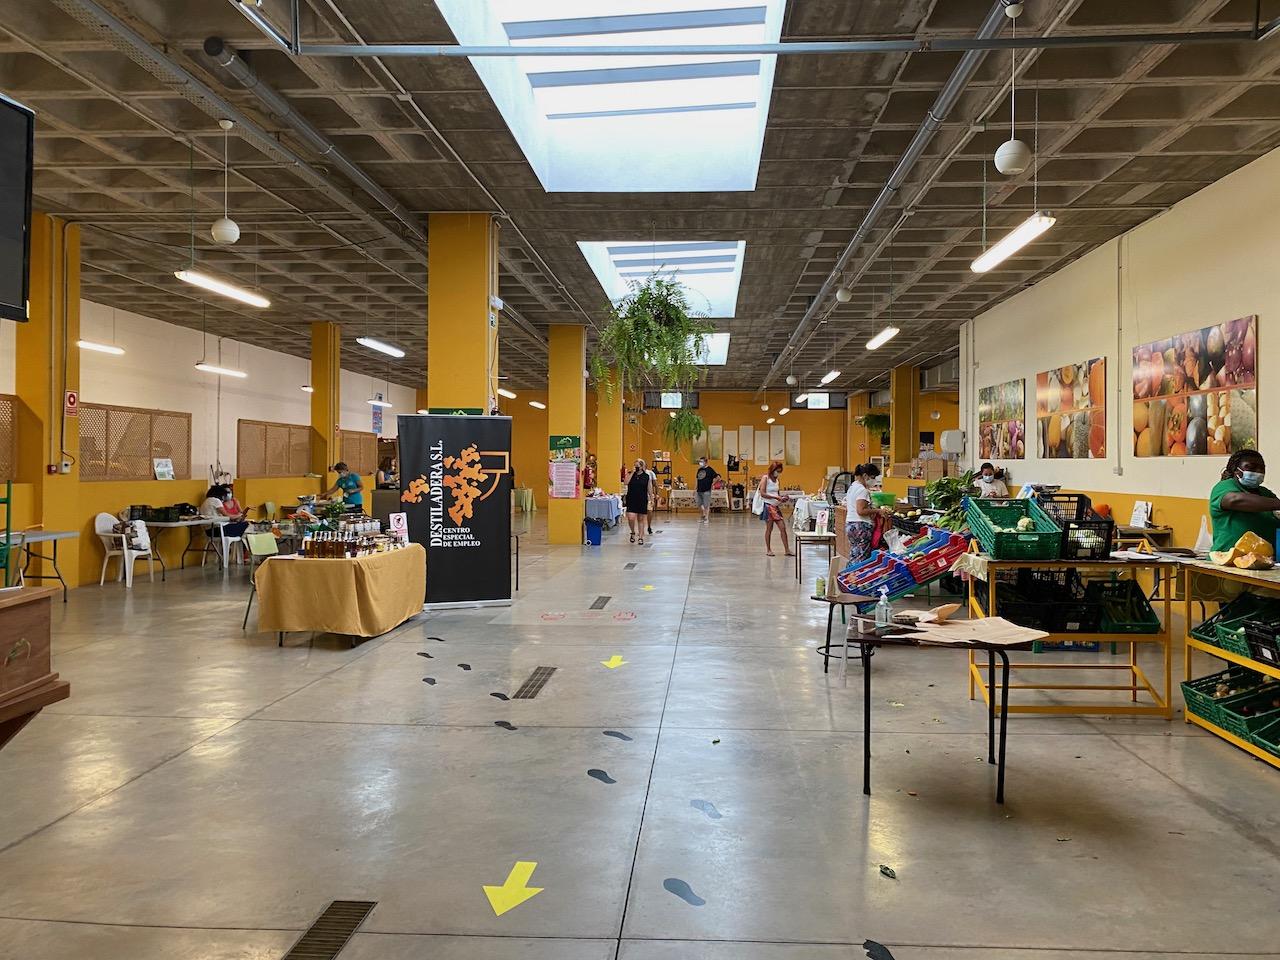 Inside the Agromercado